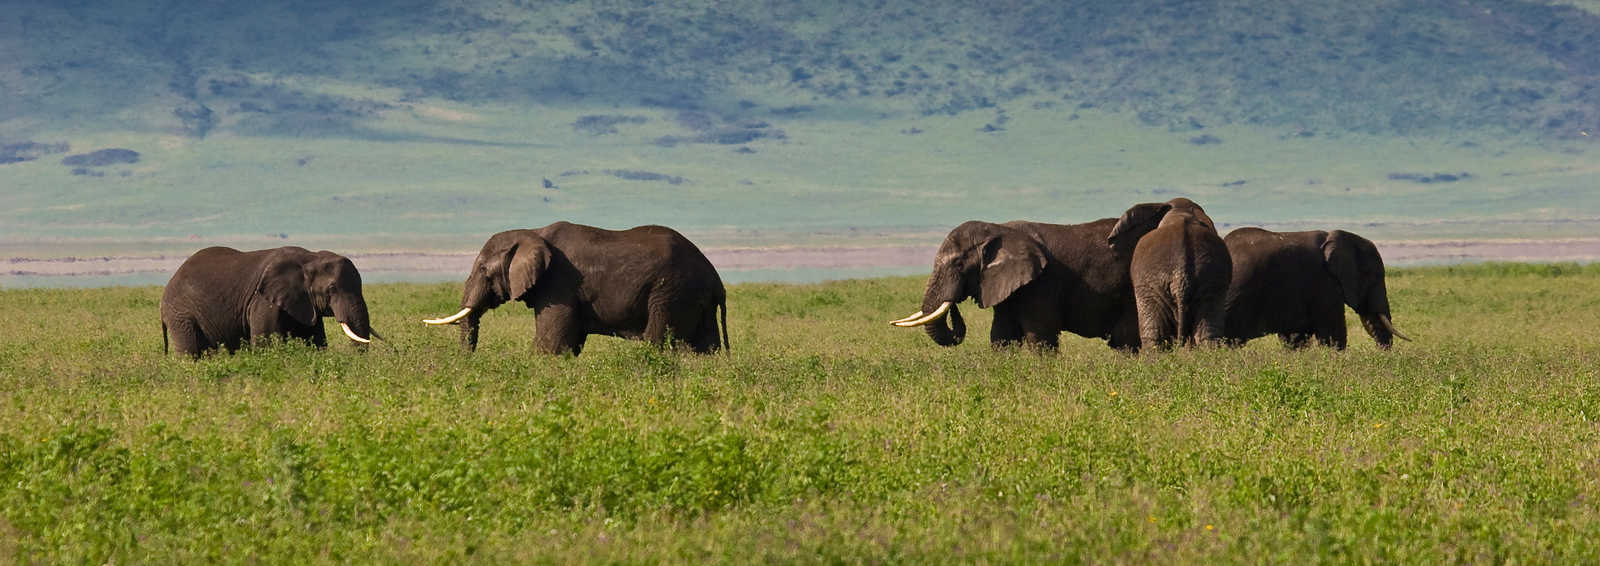 Viewing elephants on a safari holiday